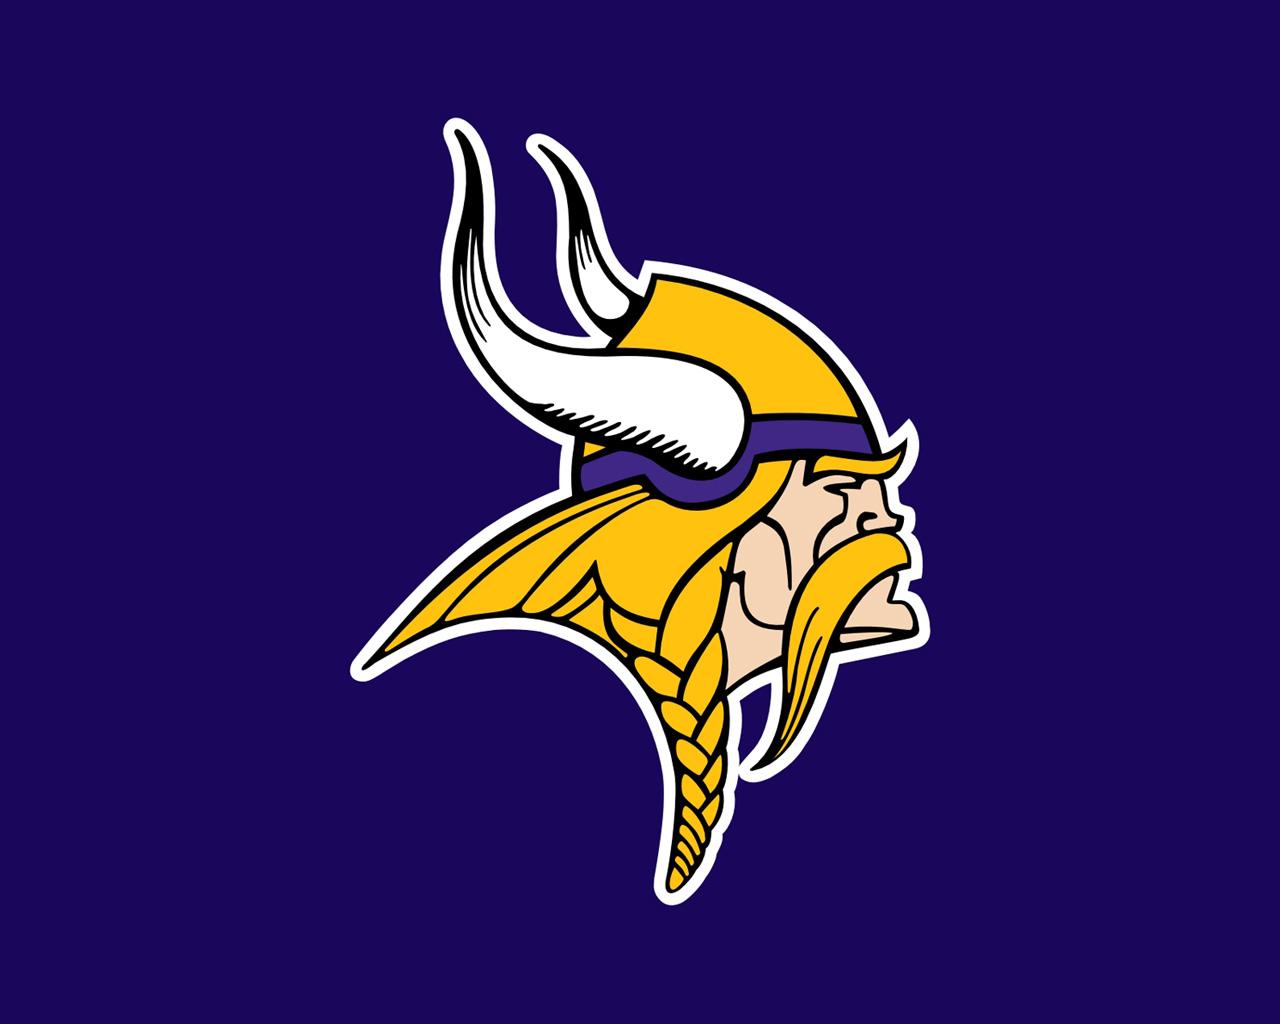 NFL Team Logos Wallpapers, NFC Teams (1280 x 1024 pixels ...